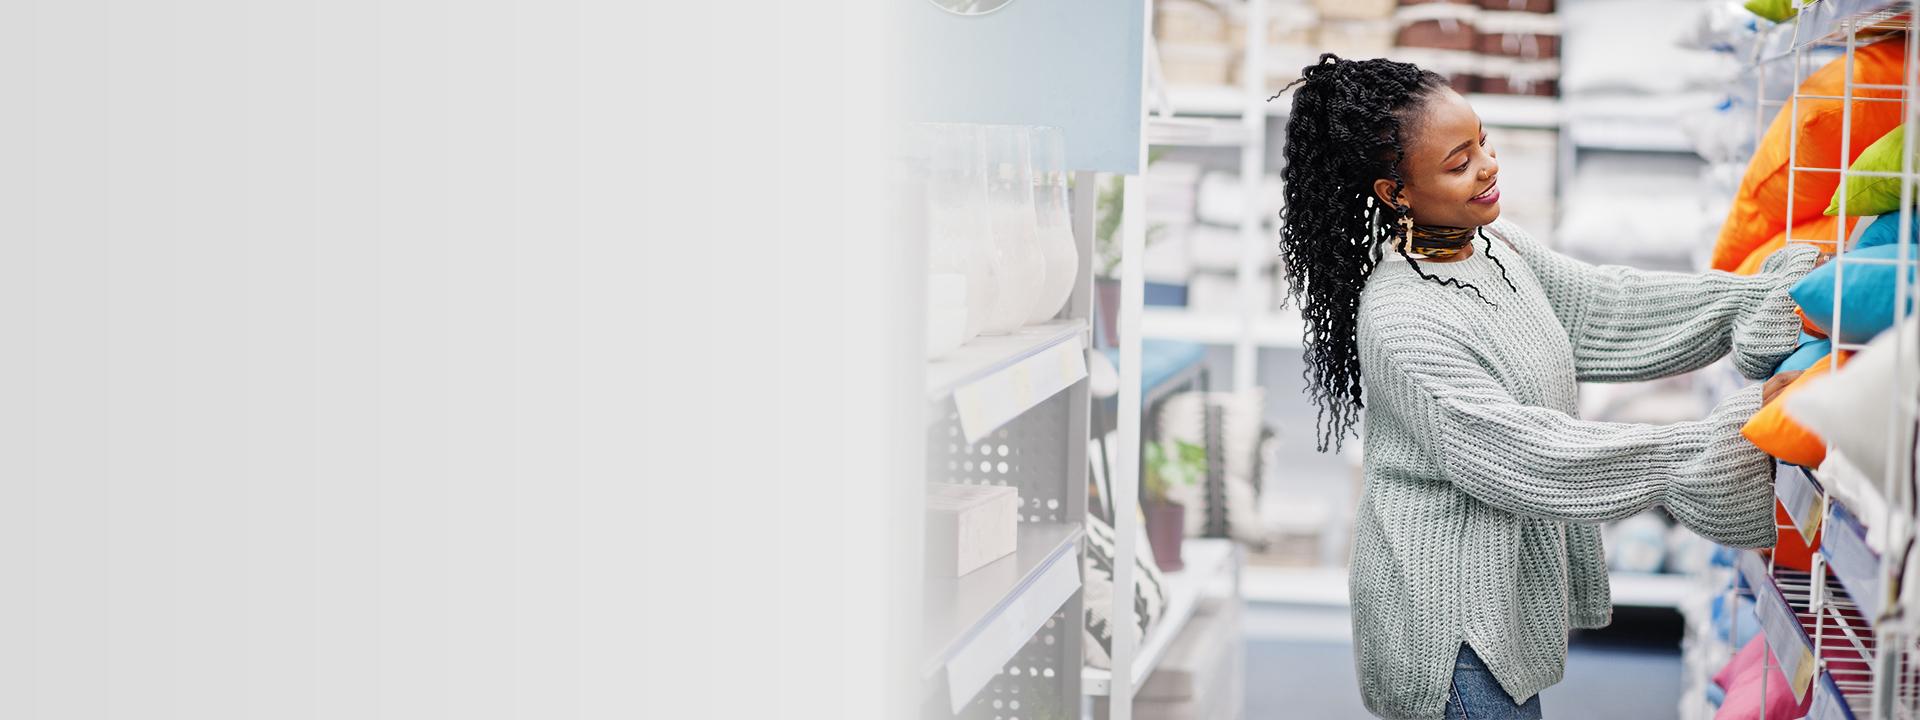 Consumer Voice Study: Summer 2020